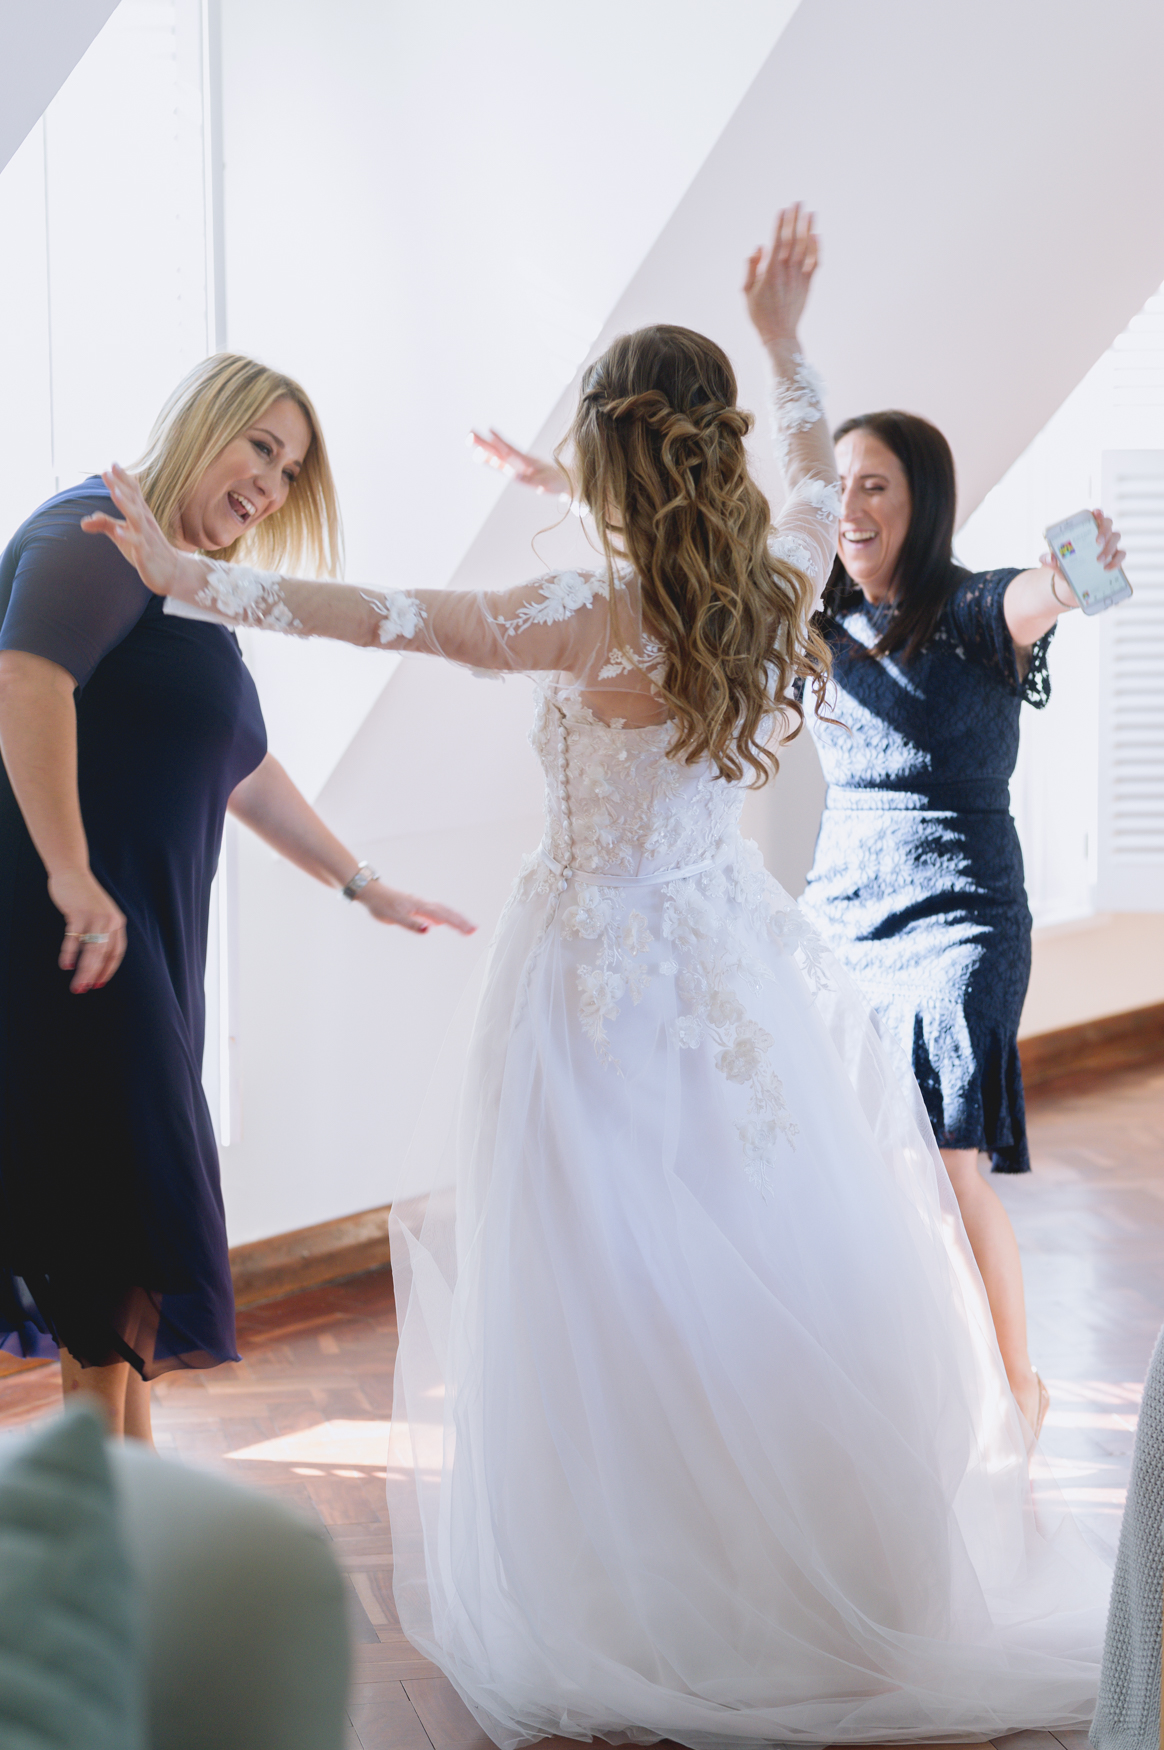 Leon_&_Martine's_Wedding_Photographs_17th_April_2019_@johnhenryweddingphoto_Low_Resolution_Web-108.JPG